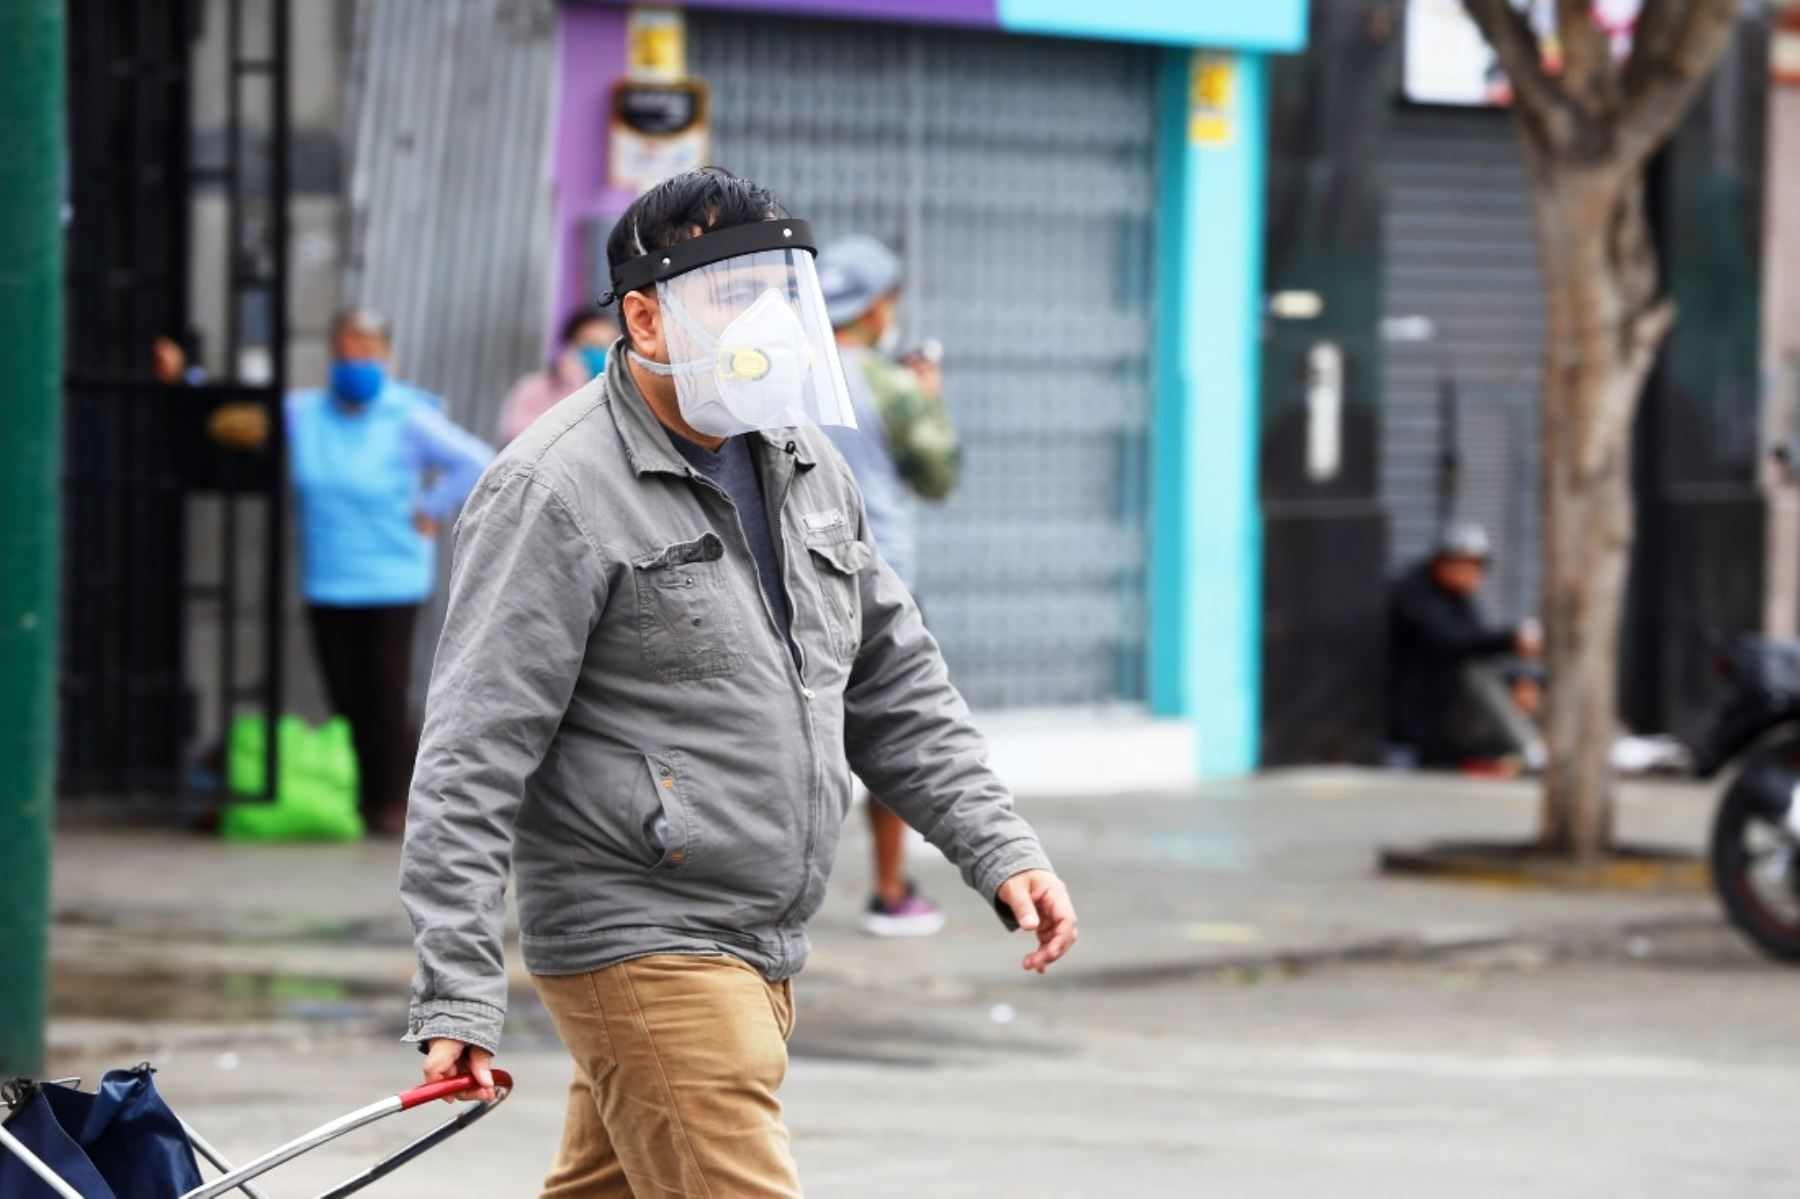 Coronavirus: protector facial nos recuerda que no debemos tocarnos la cara. Foto: ANDINA/Difusión.